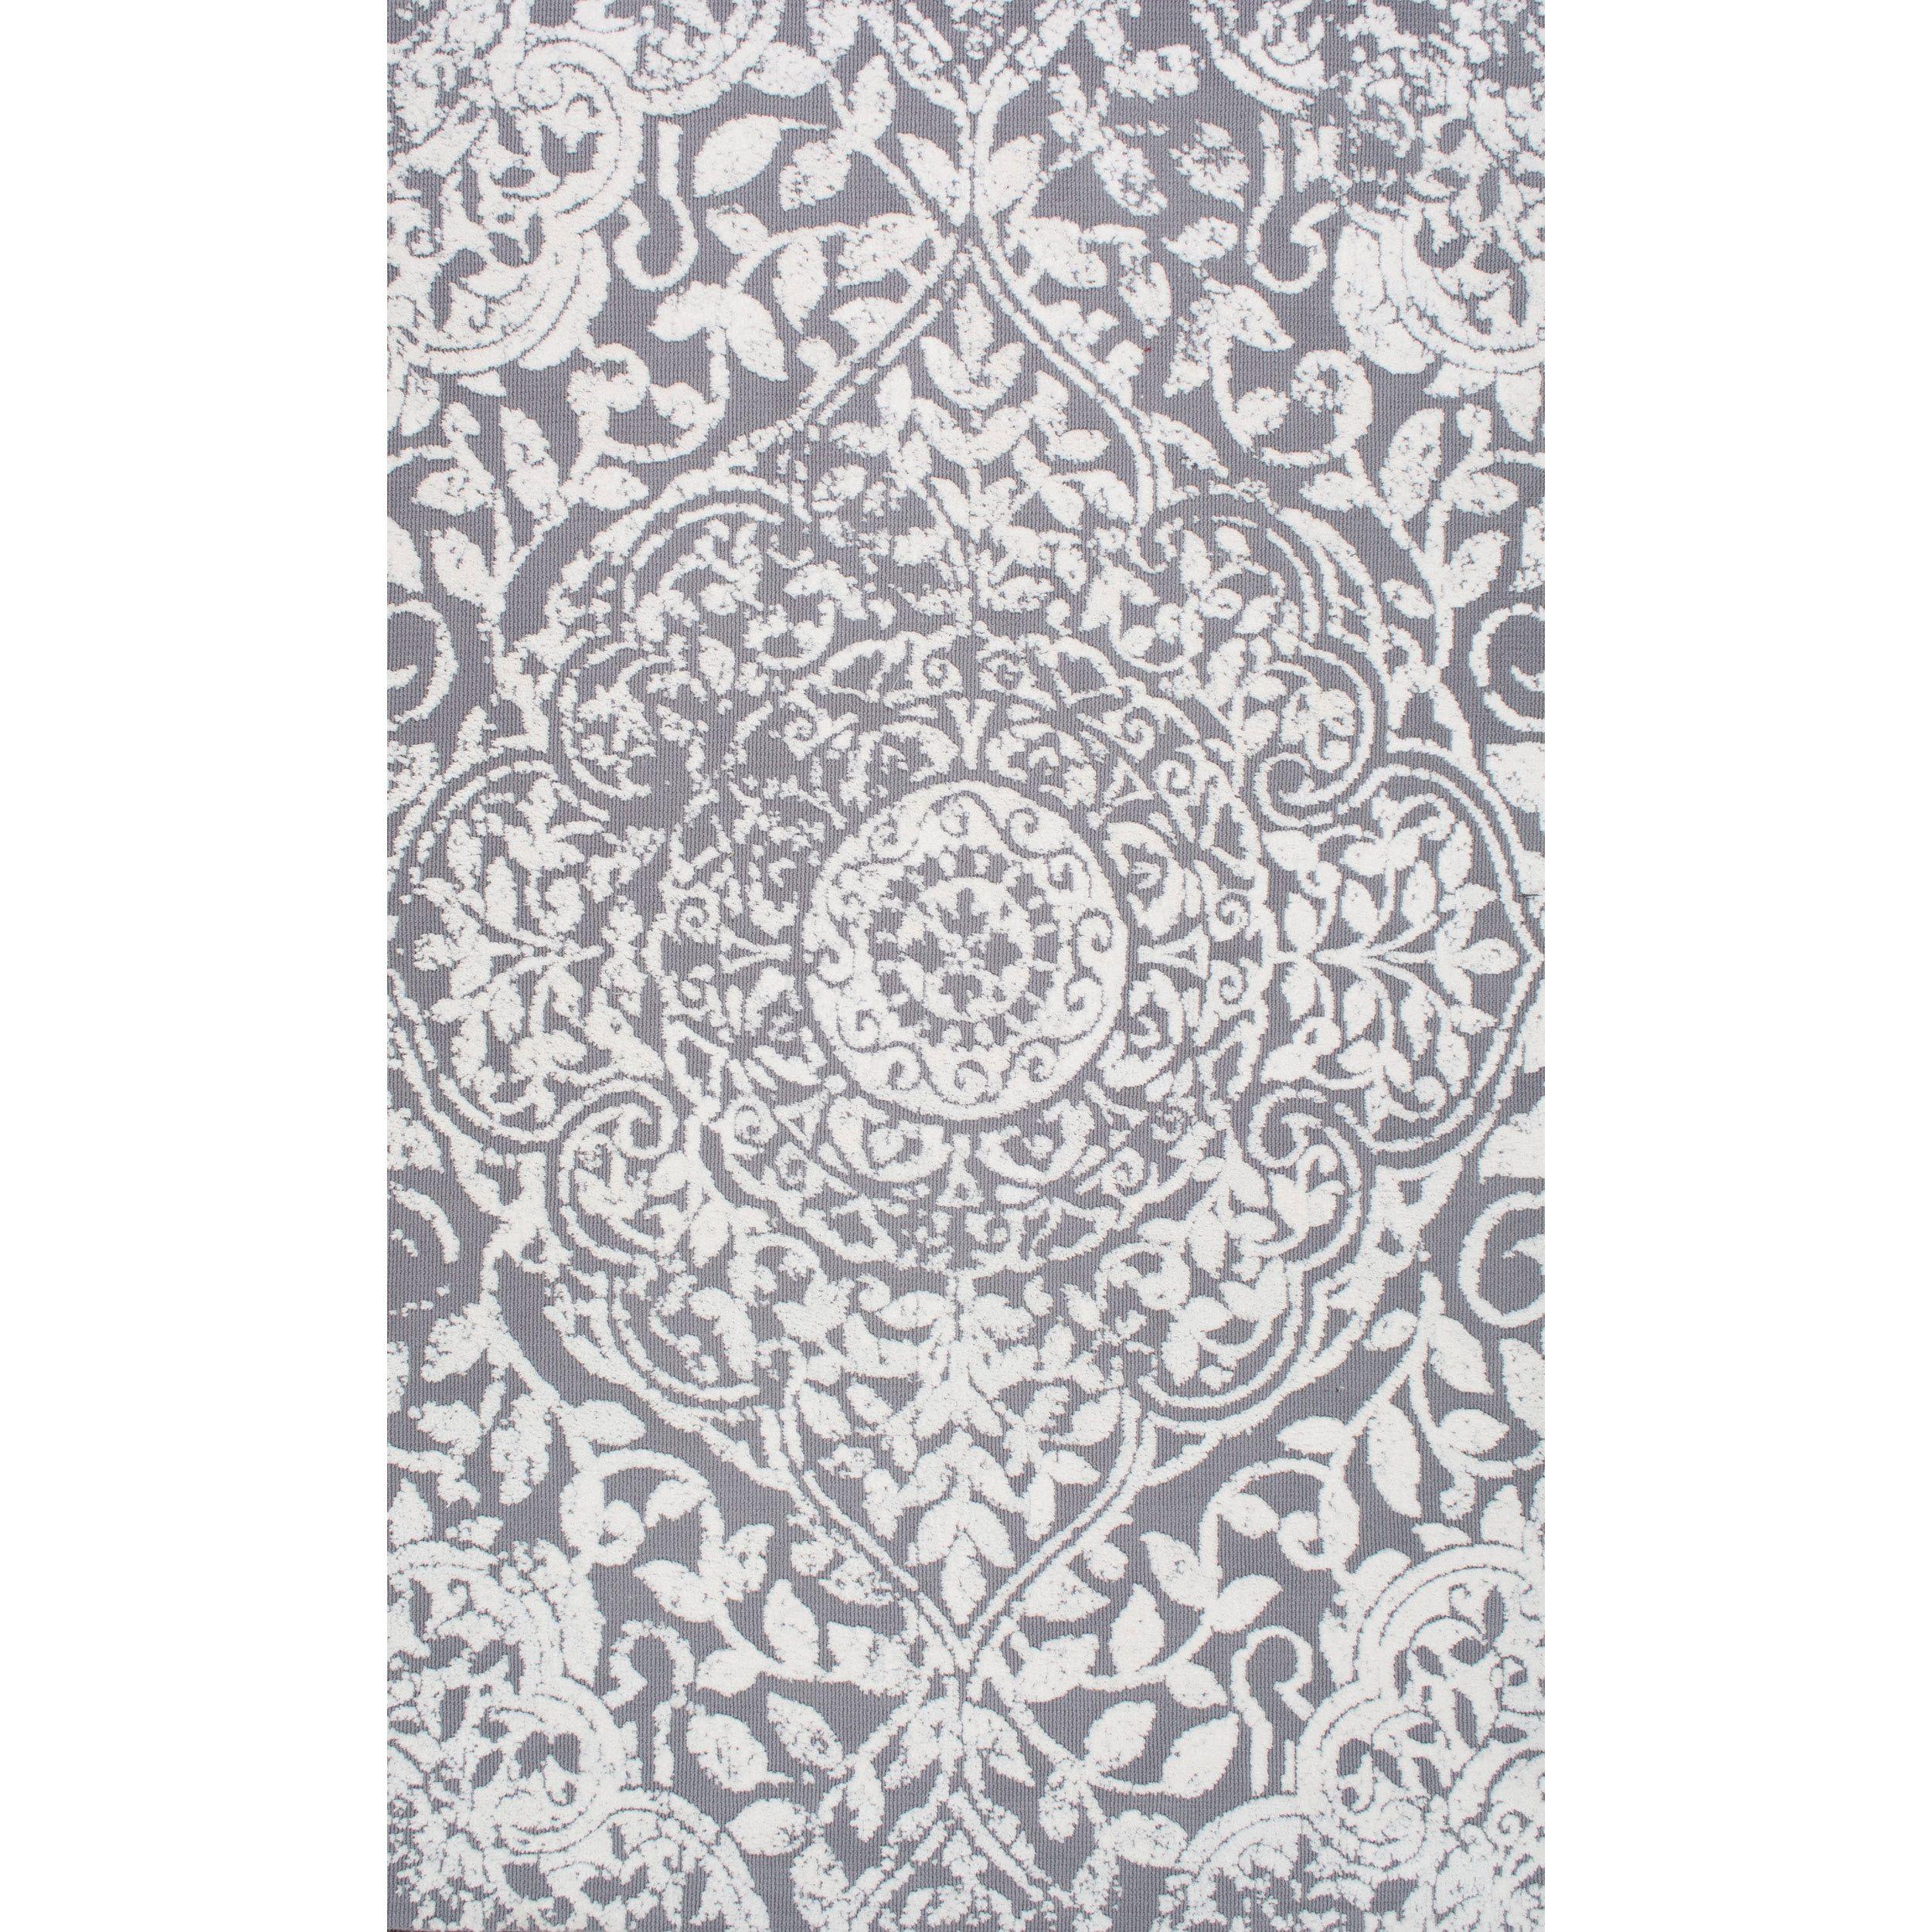 Nuloom modern vintage fancy floral grey rug 7 39 6 x 9 39 6 for 7x9 bathroom designs